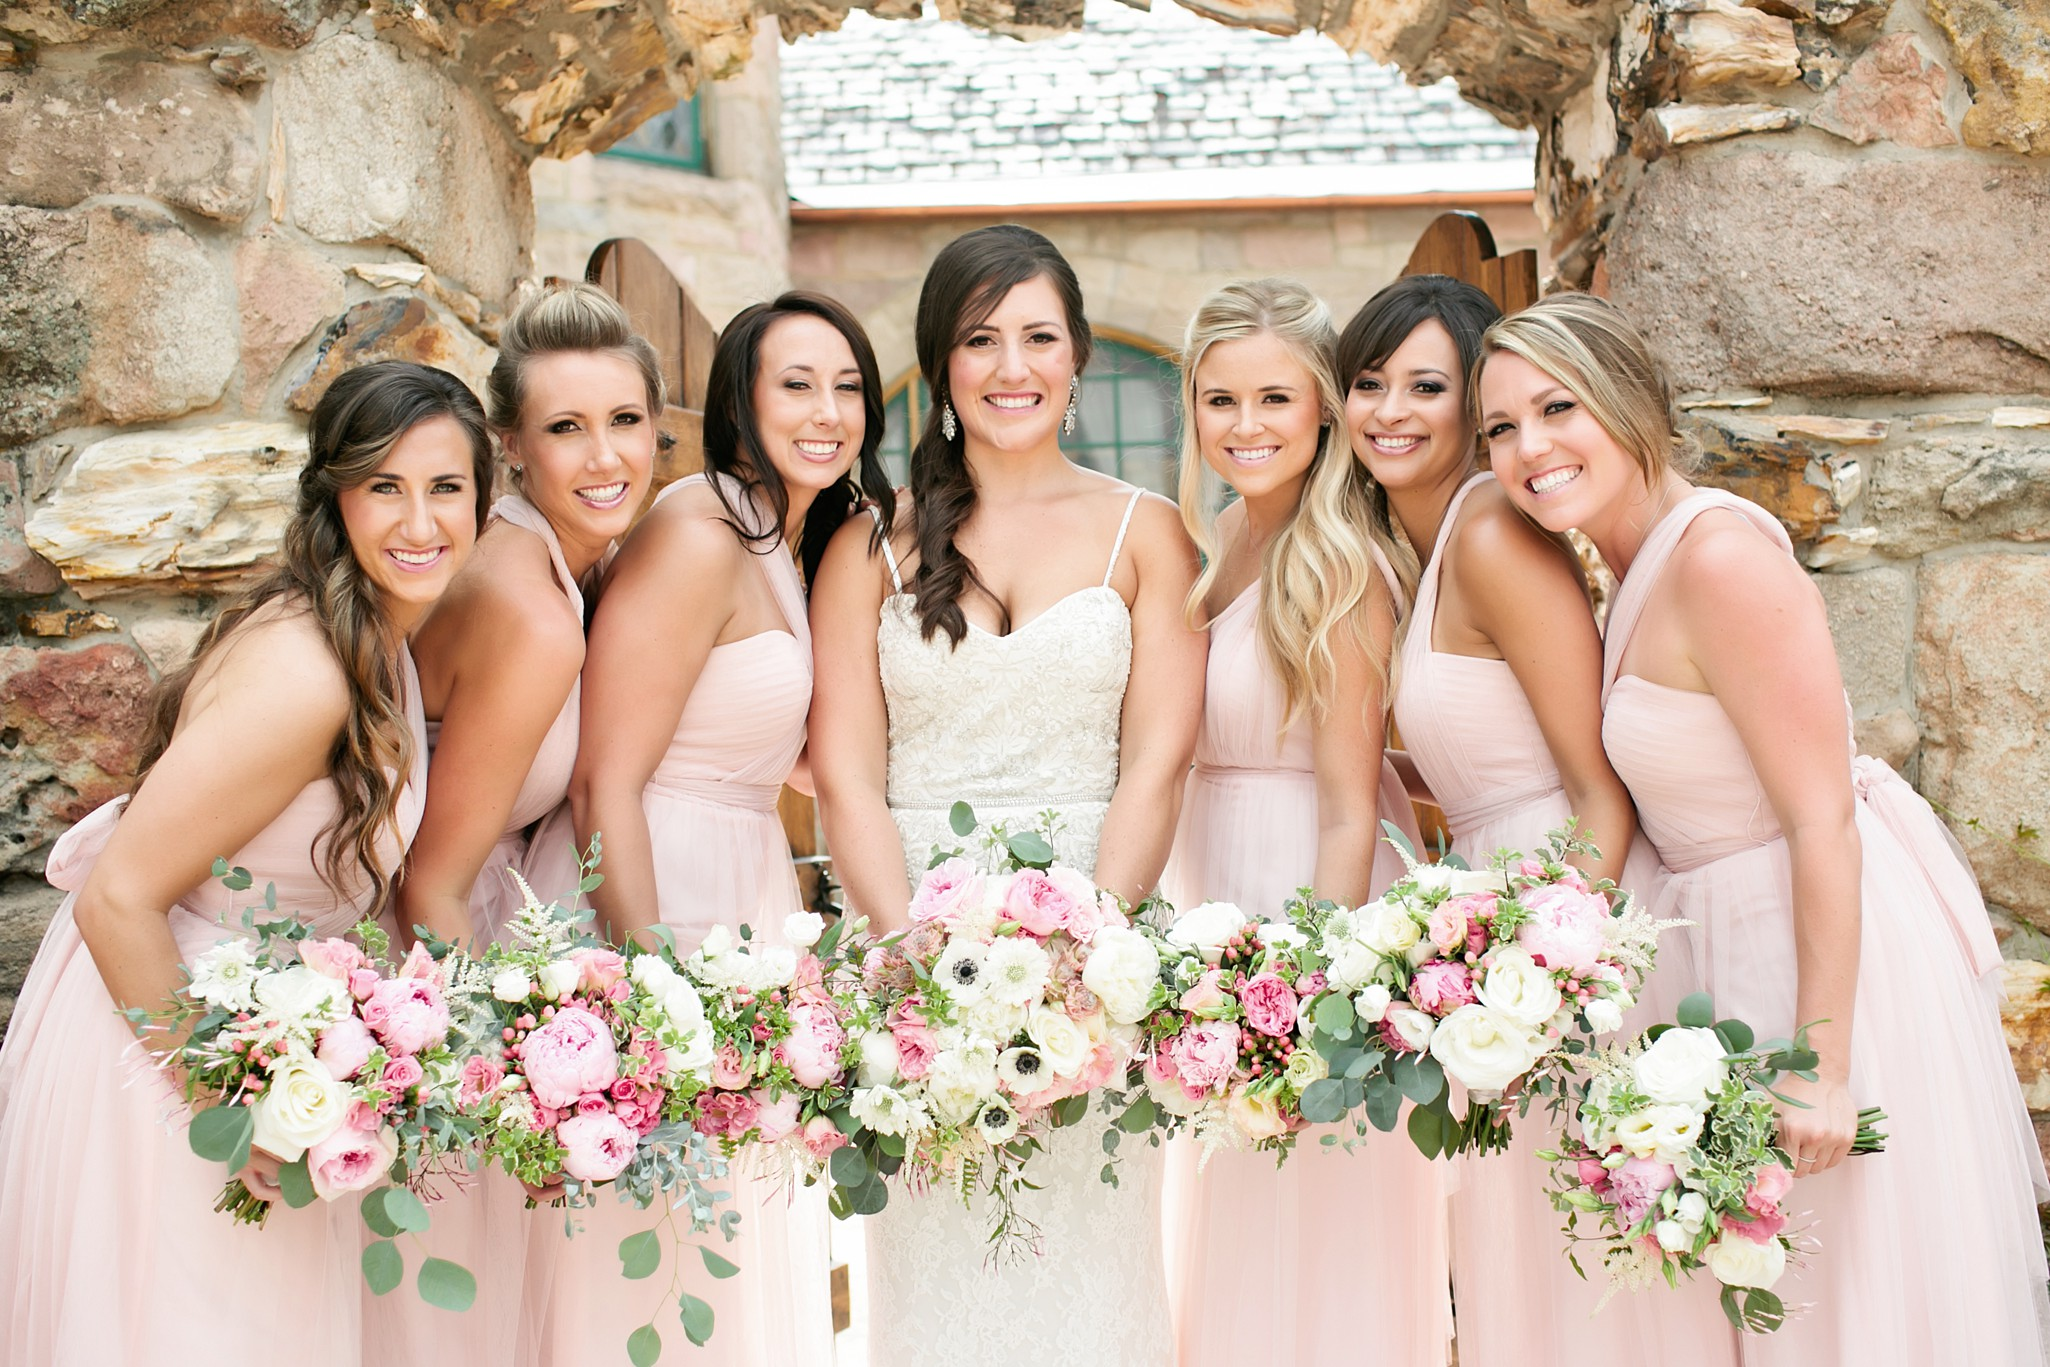 karim_devon_wedding_0004.jpg